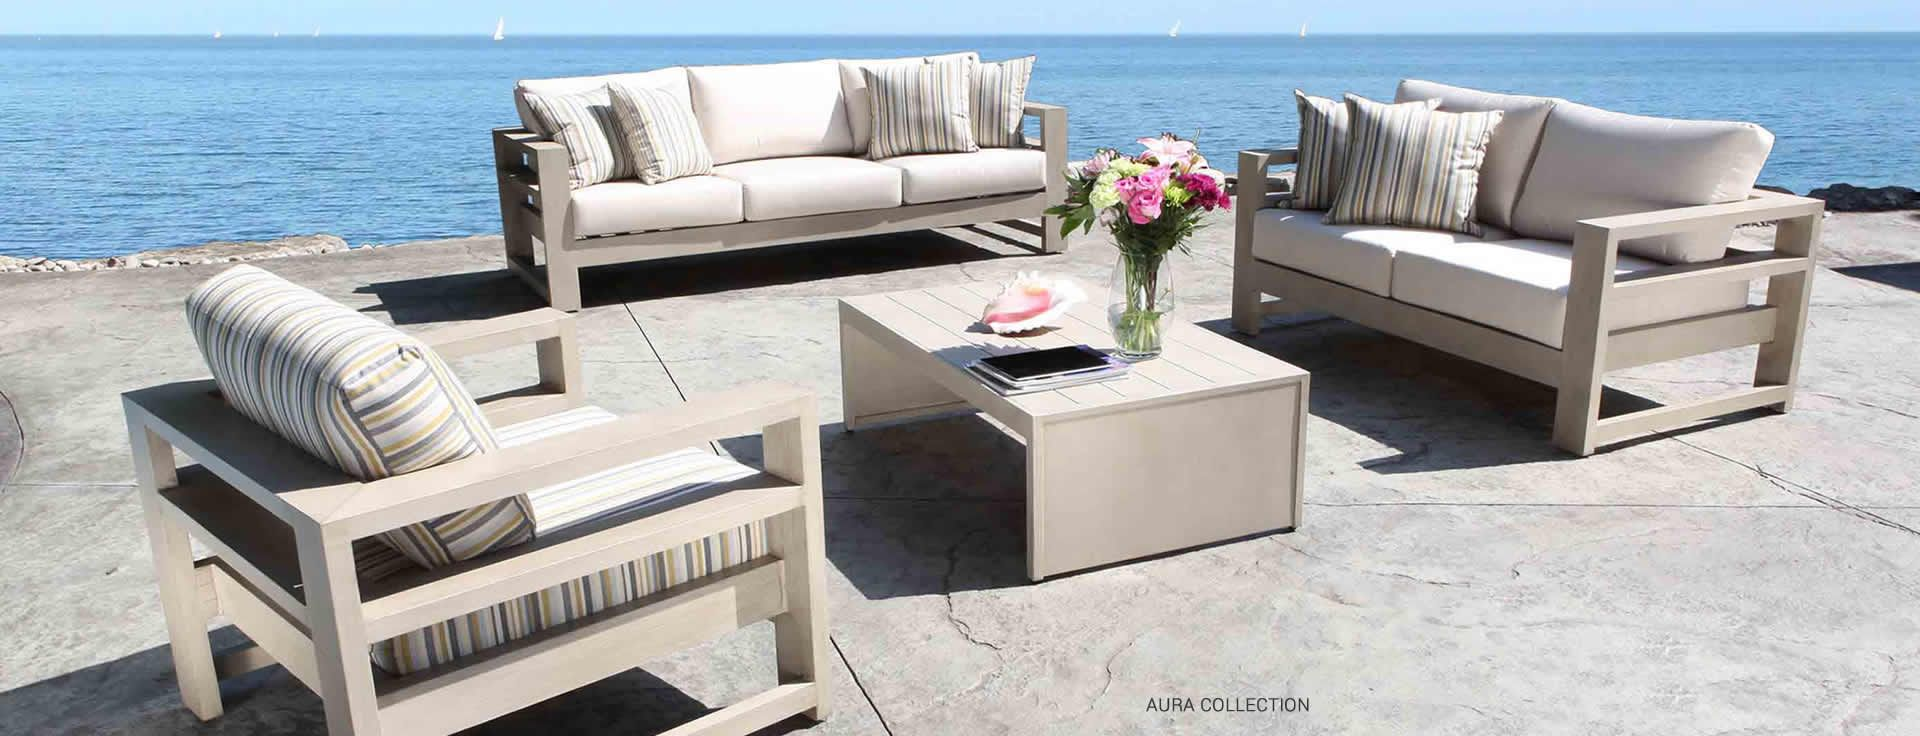 Aura collection cabana coast